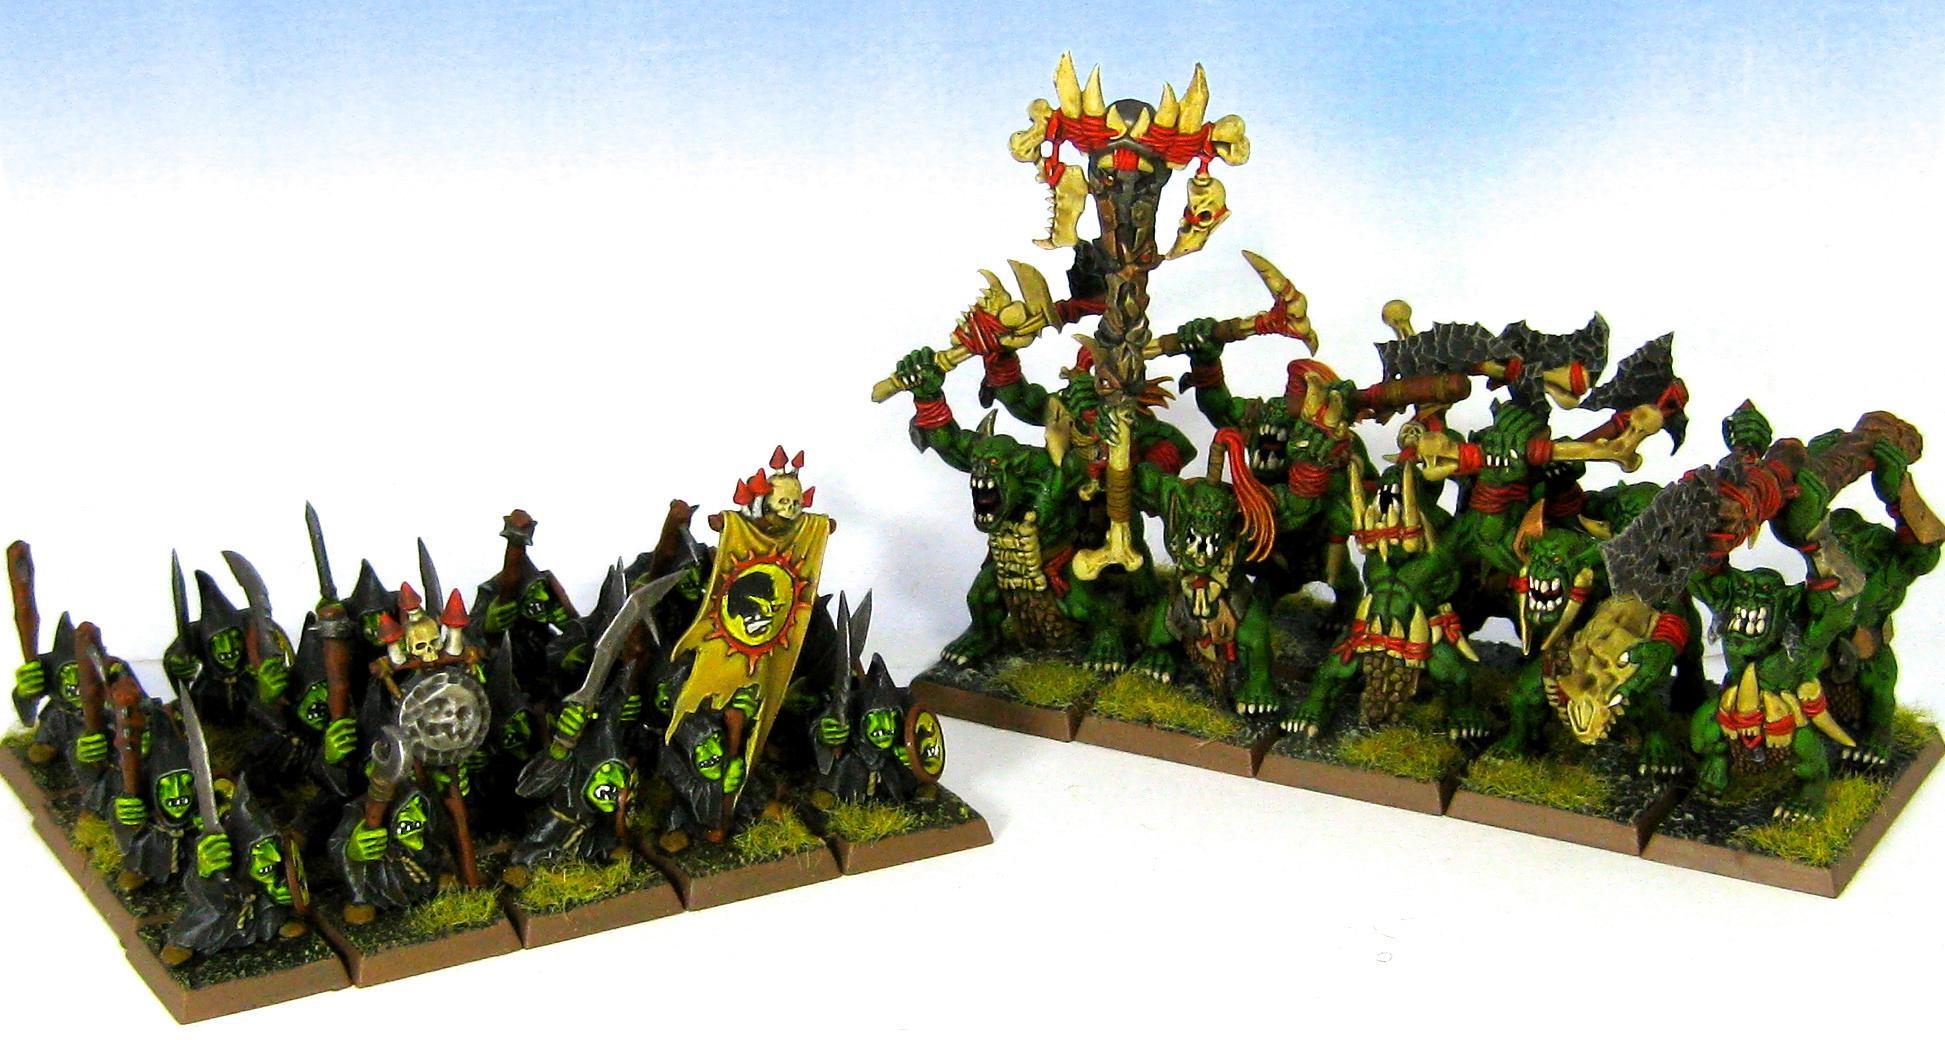 Feral, Orks, Warhammer Fantasy